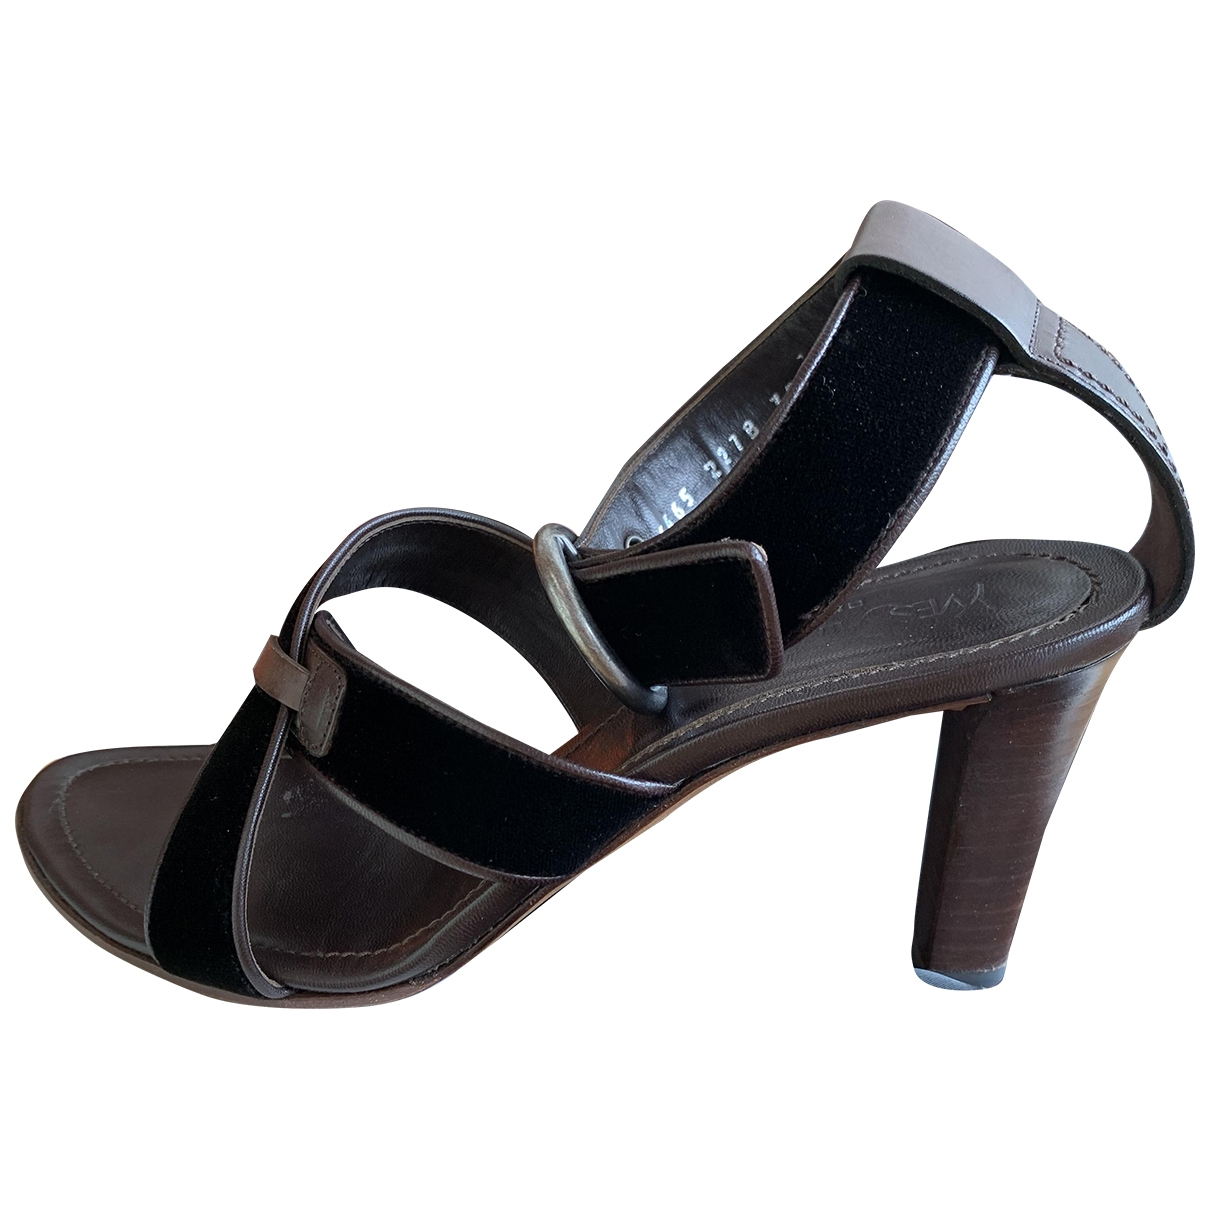 Sandalias romanas de Terciopelo Yves Saint Laurent